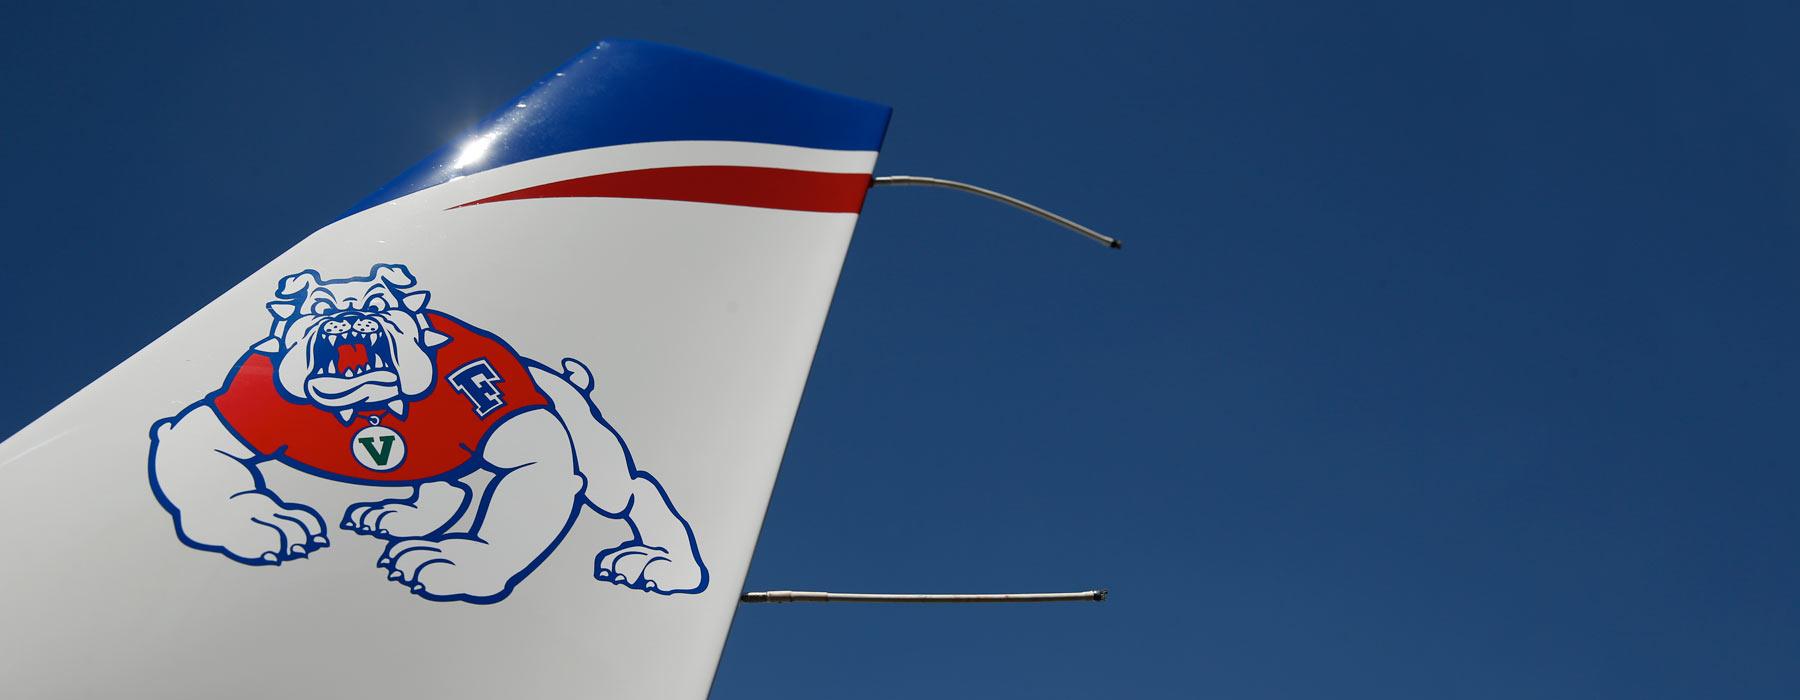 airplane with bulldog